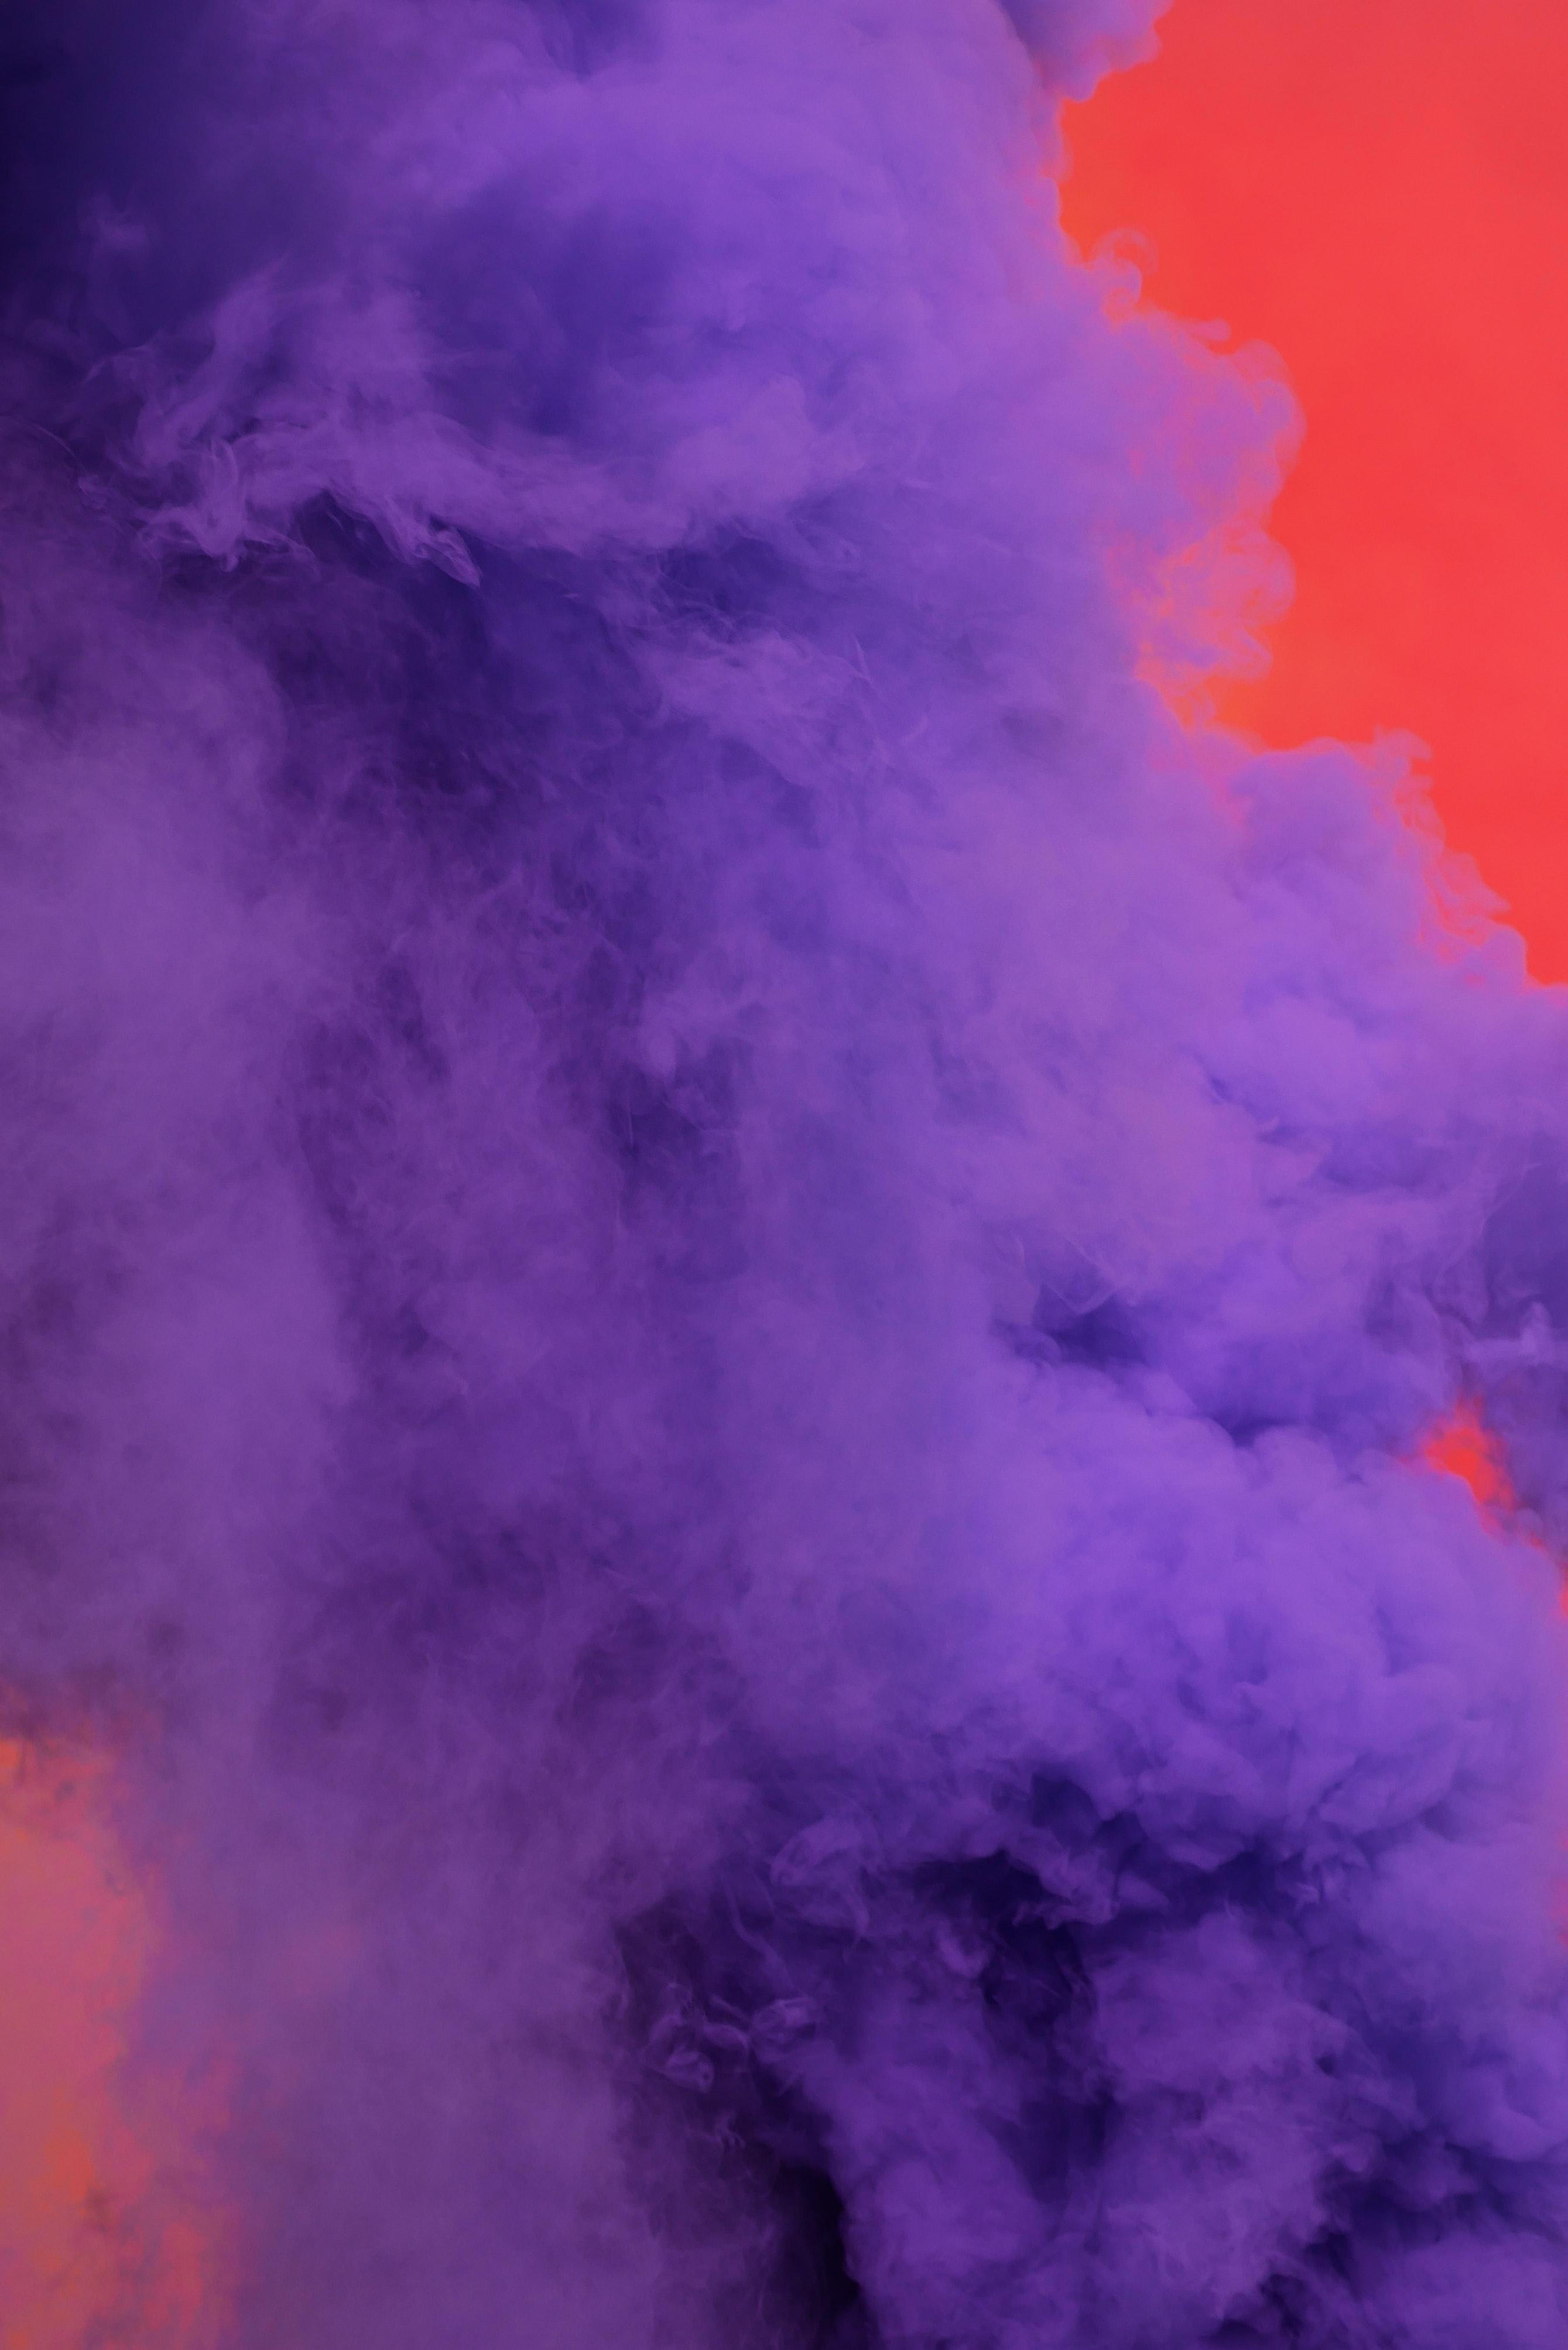 Purple Wallpapers Free HD Download [500 HQ]